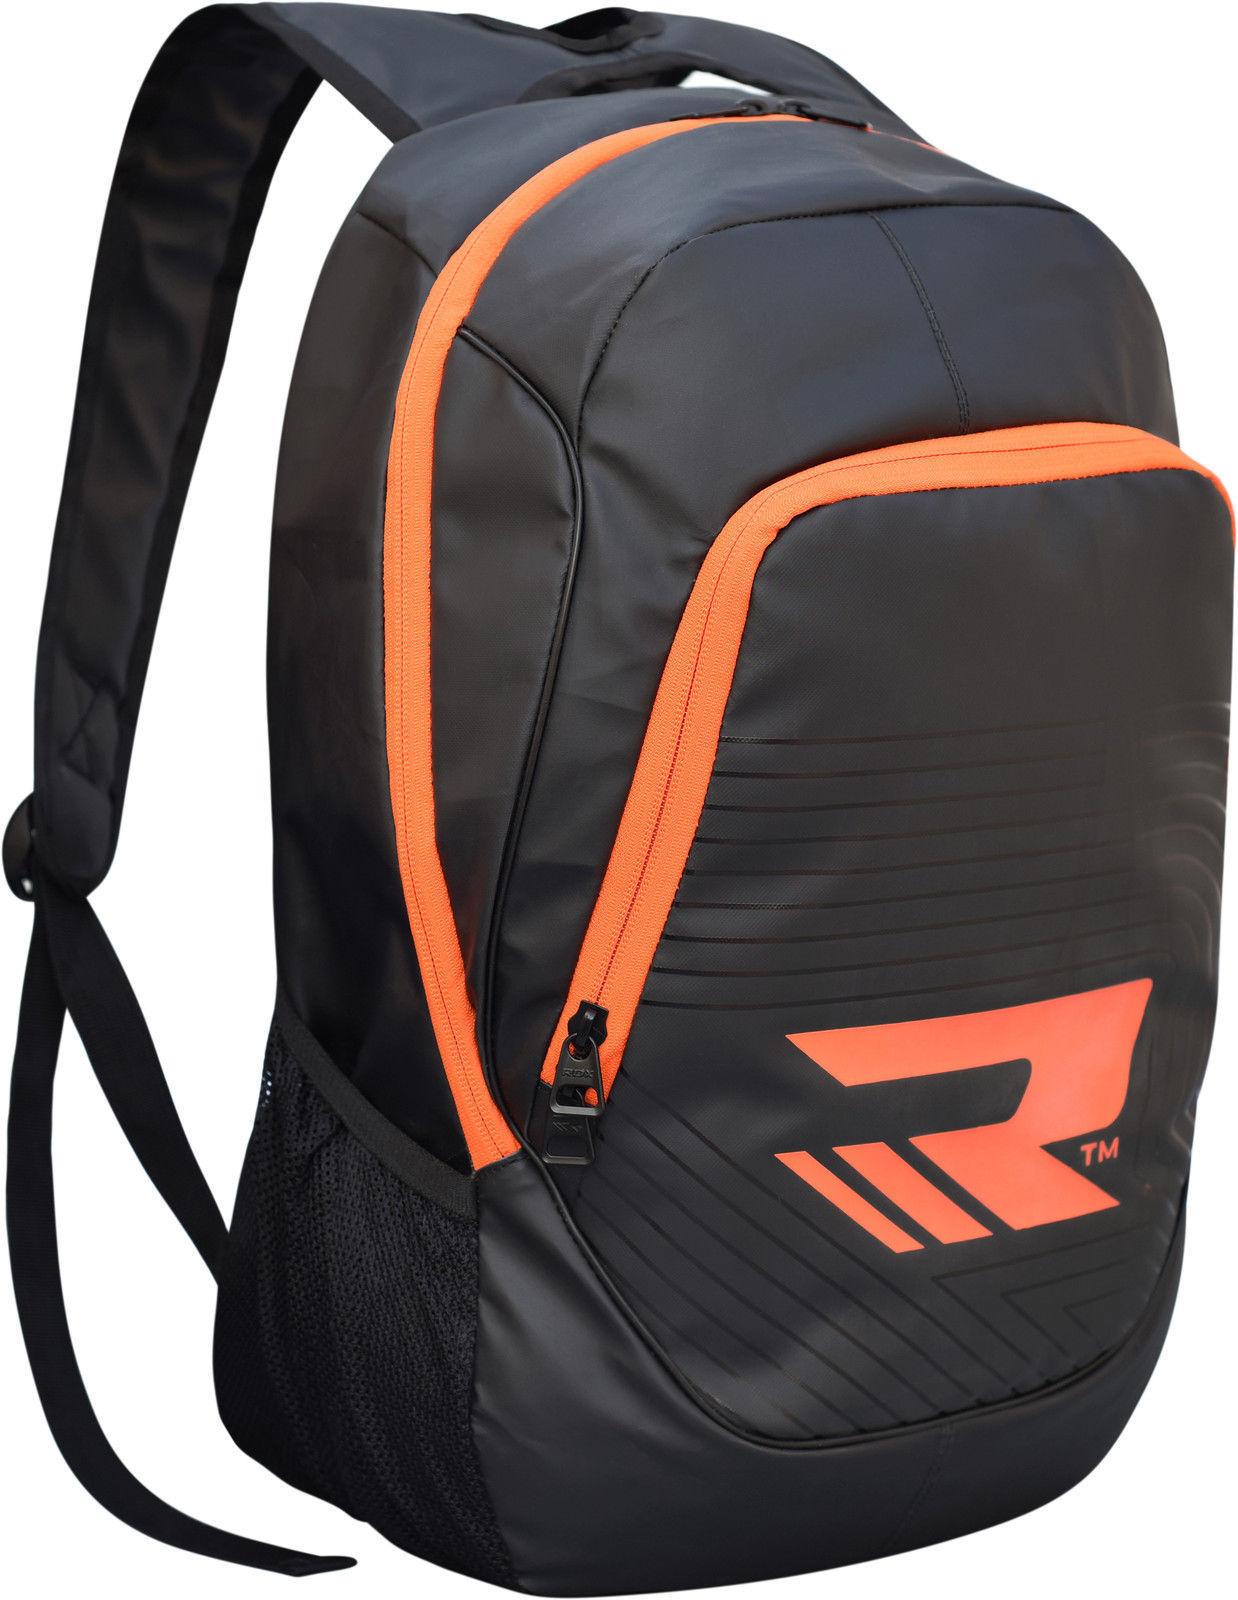 fb6846b759 Fitness, Running & Yoga Gym Bags RDX Hiking Rucksack Kit Bag Gym Sports  Holdall Backpack Duffle Training ...